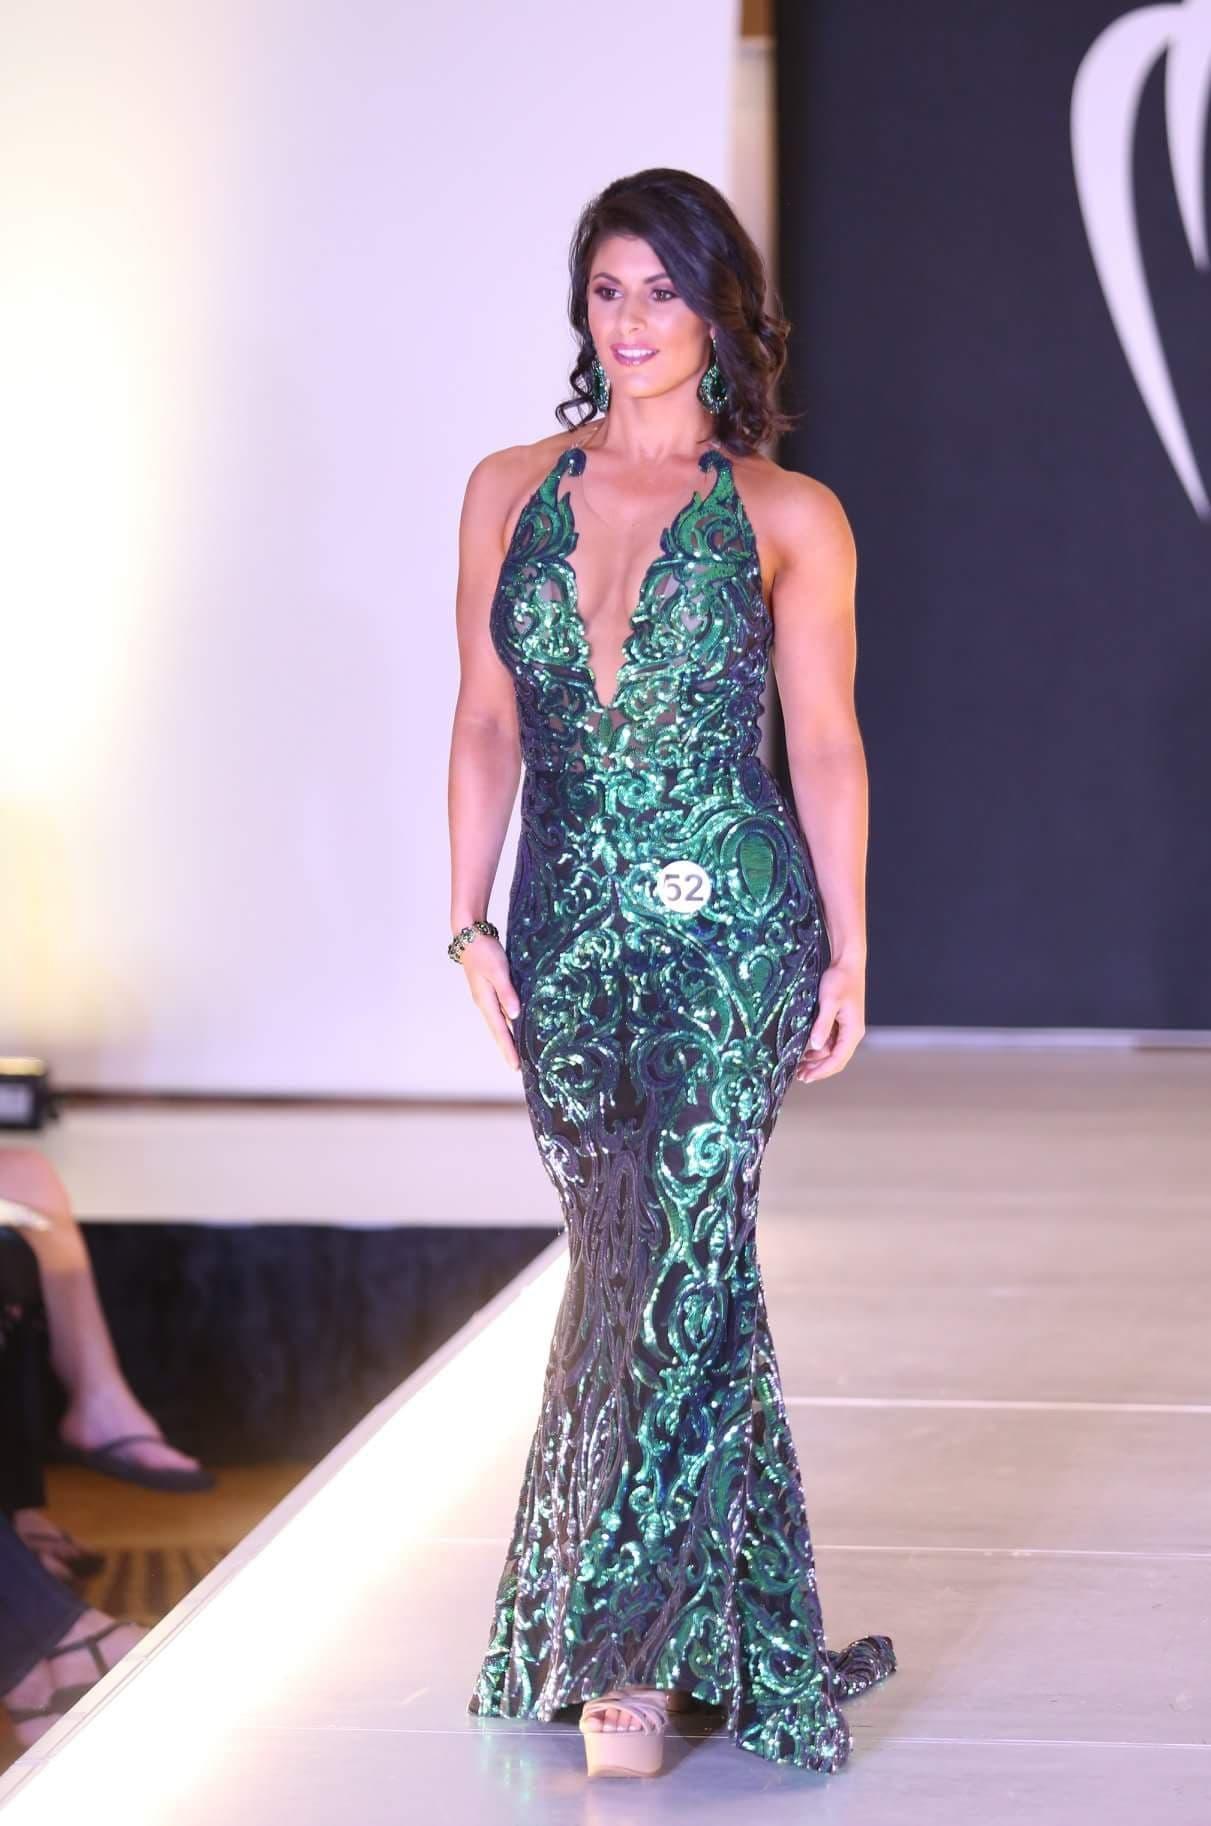 Alyssa Straniero-2018 Elite Miss MD